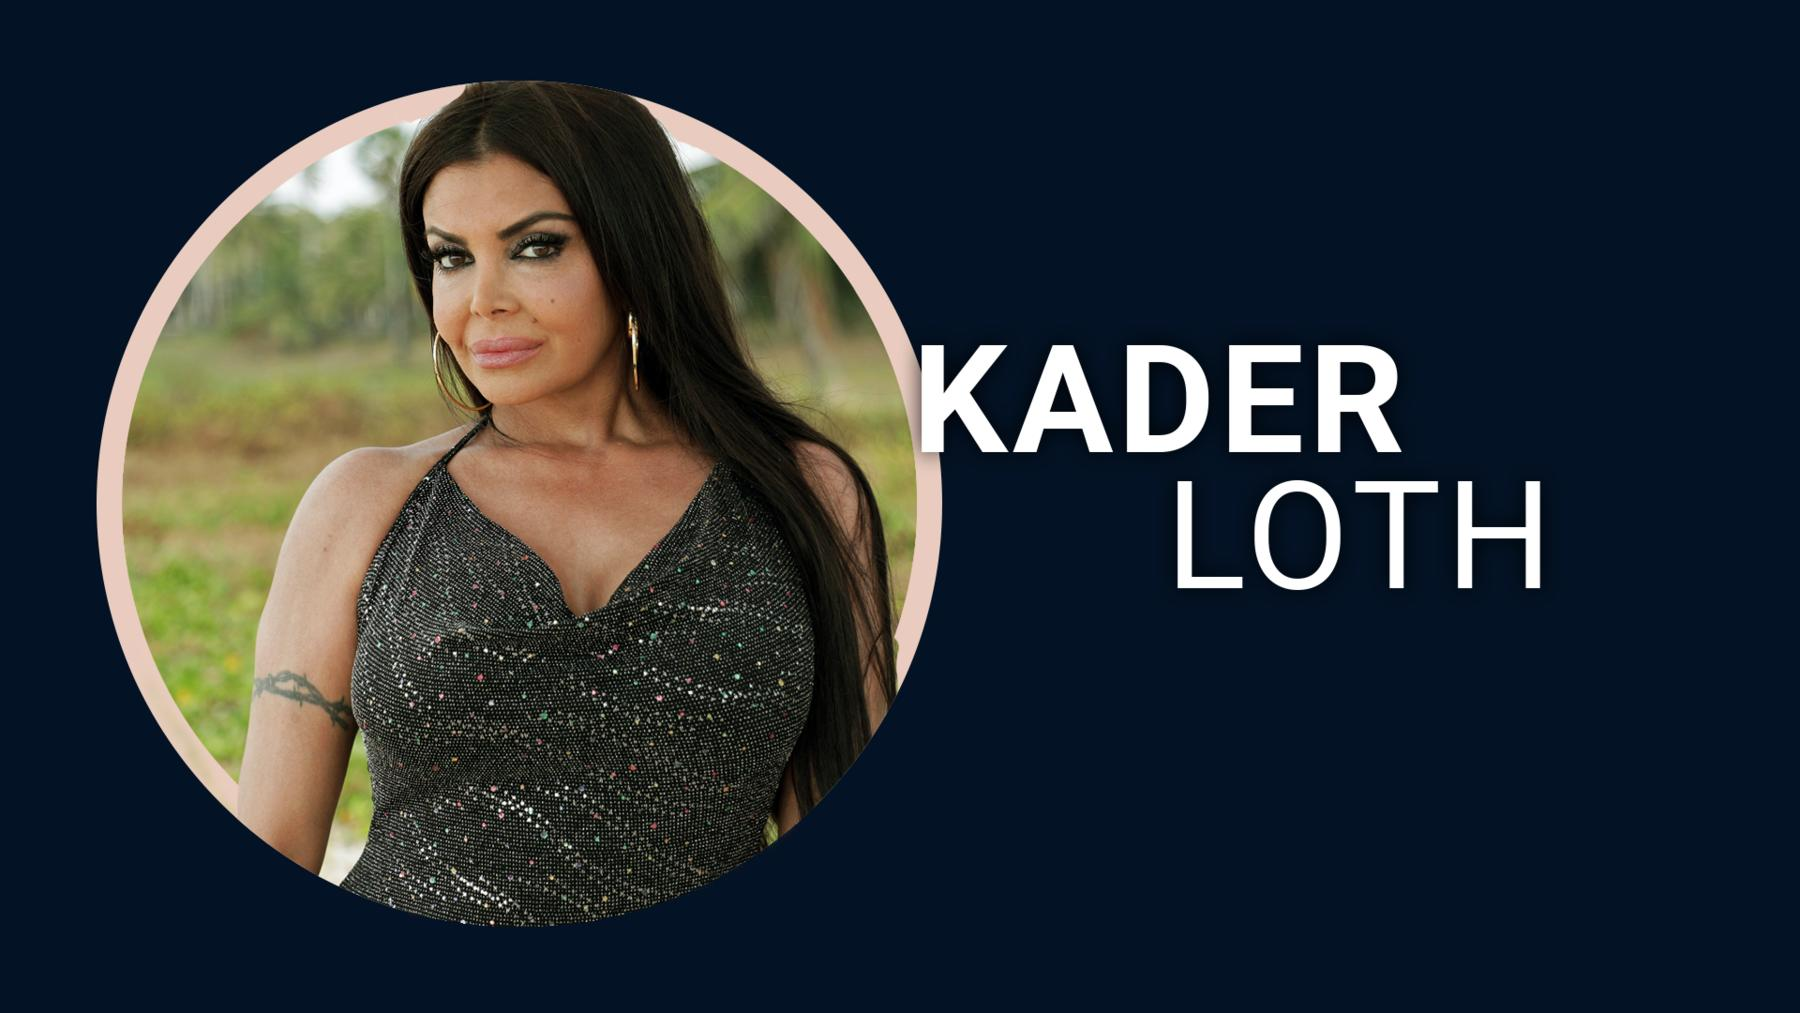 Kader Loth